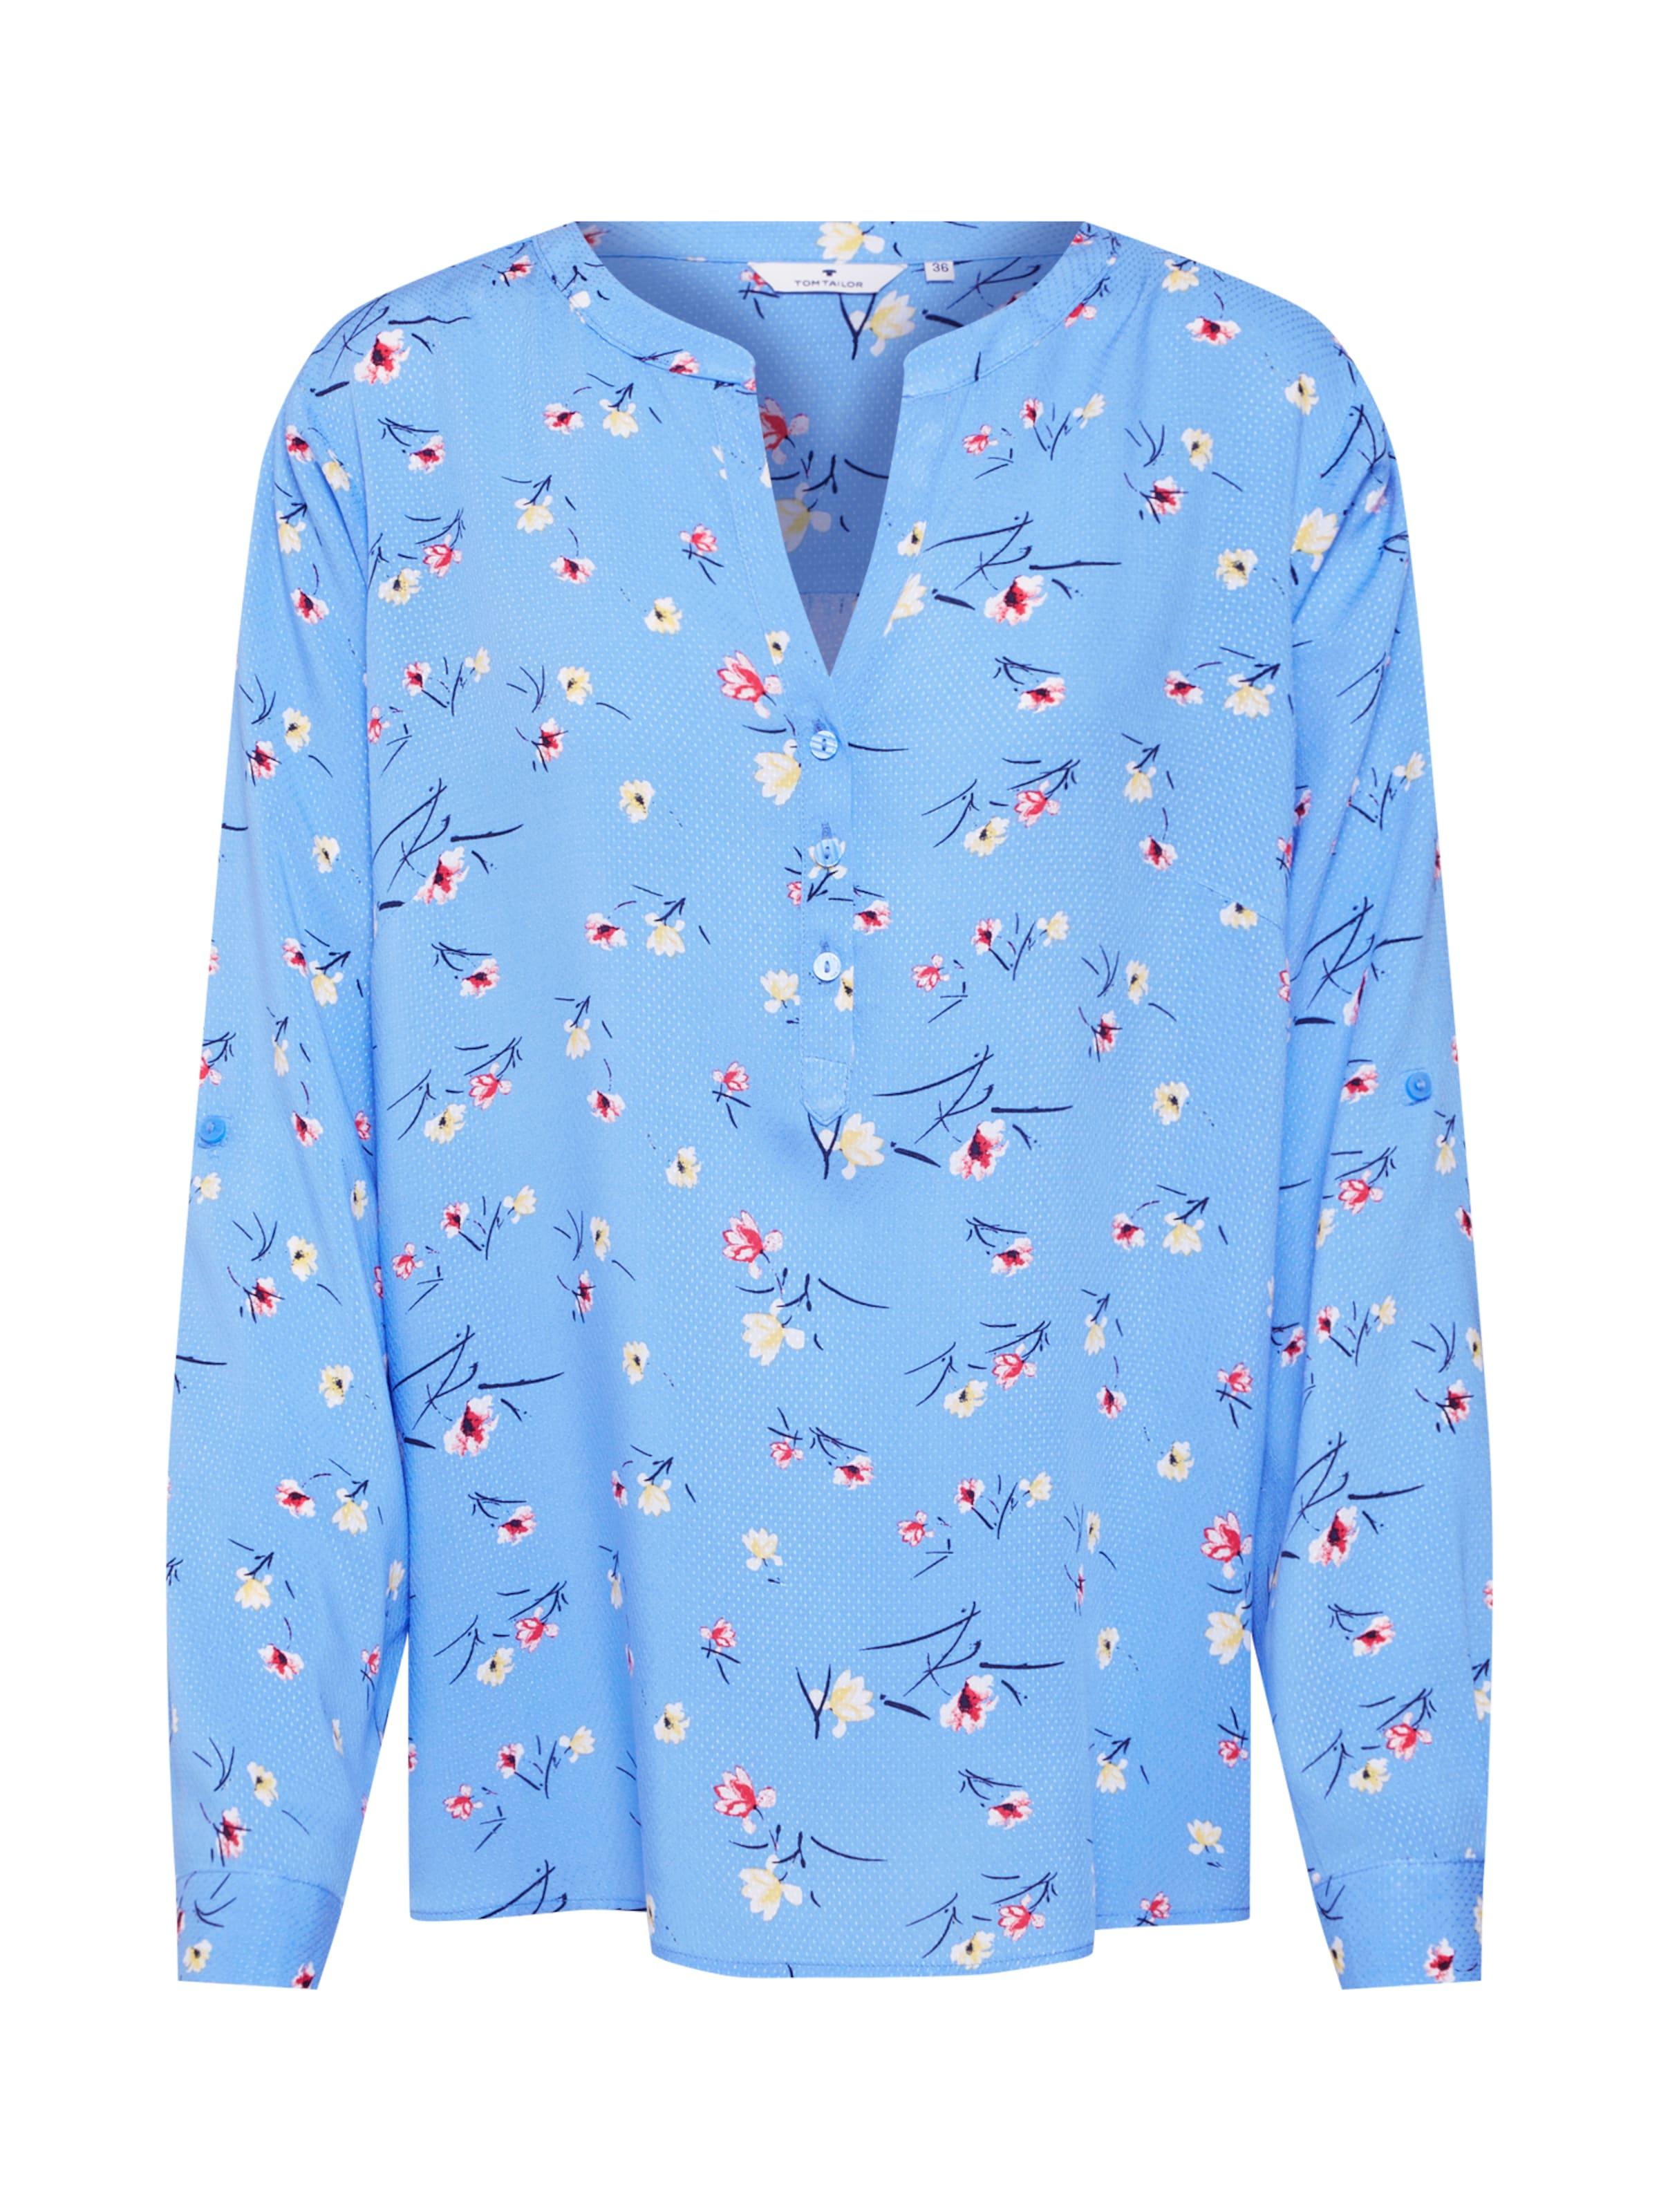 Bluse Tailor Blouse' Blau Tom In 'printed VqSMGpUz